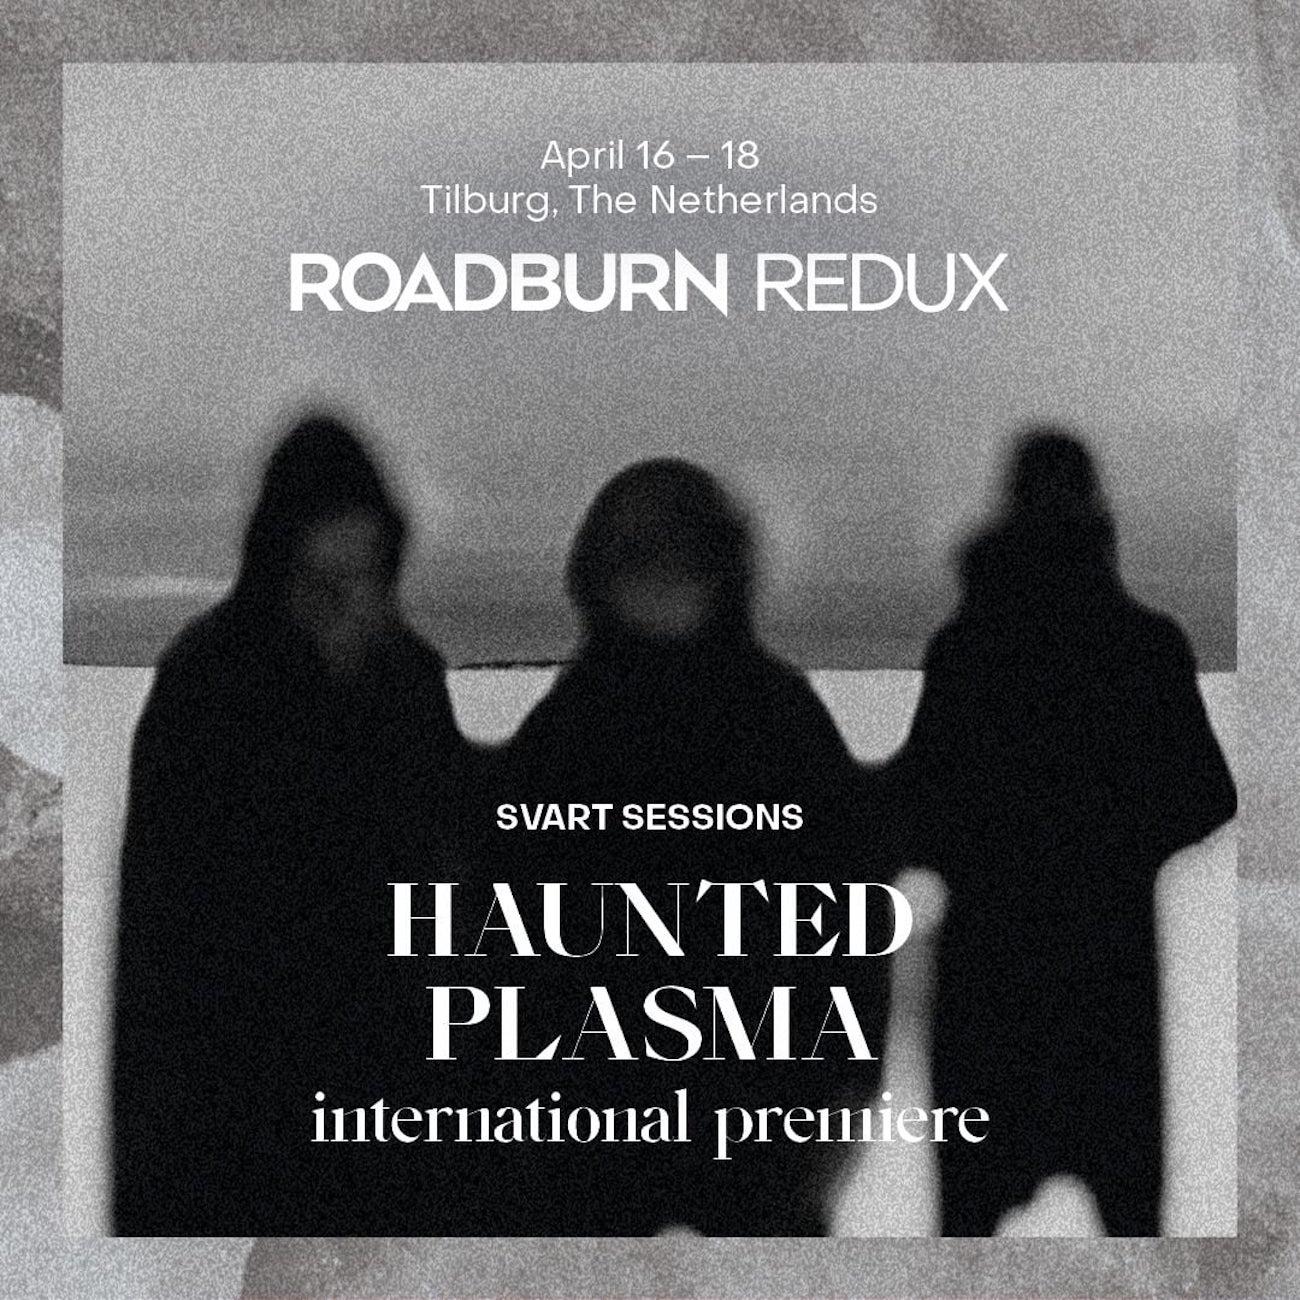 roadburnredux2